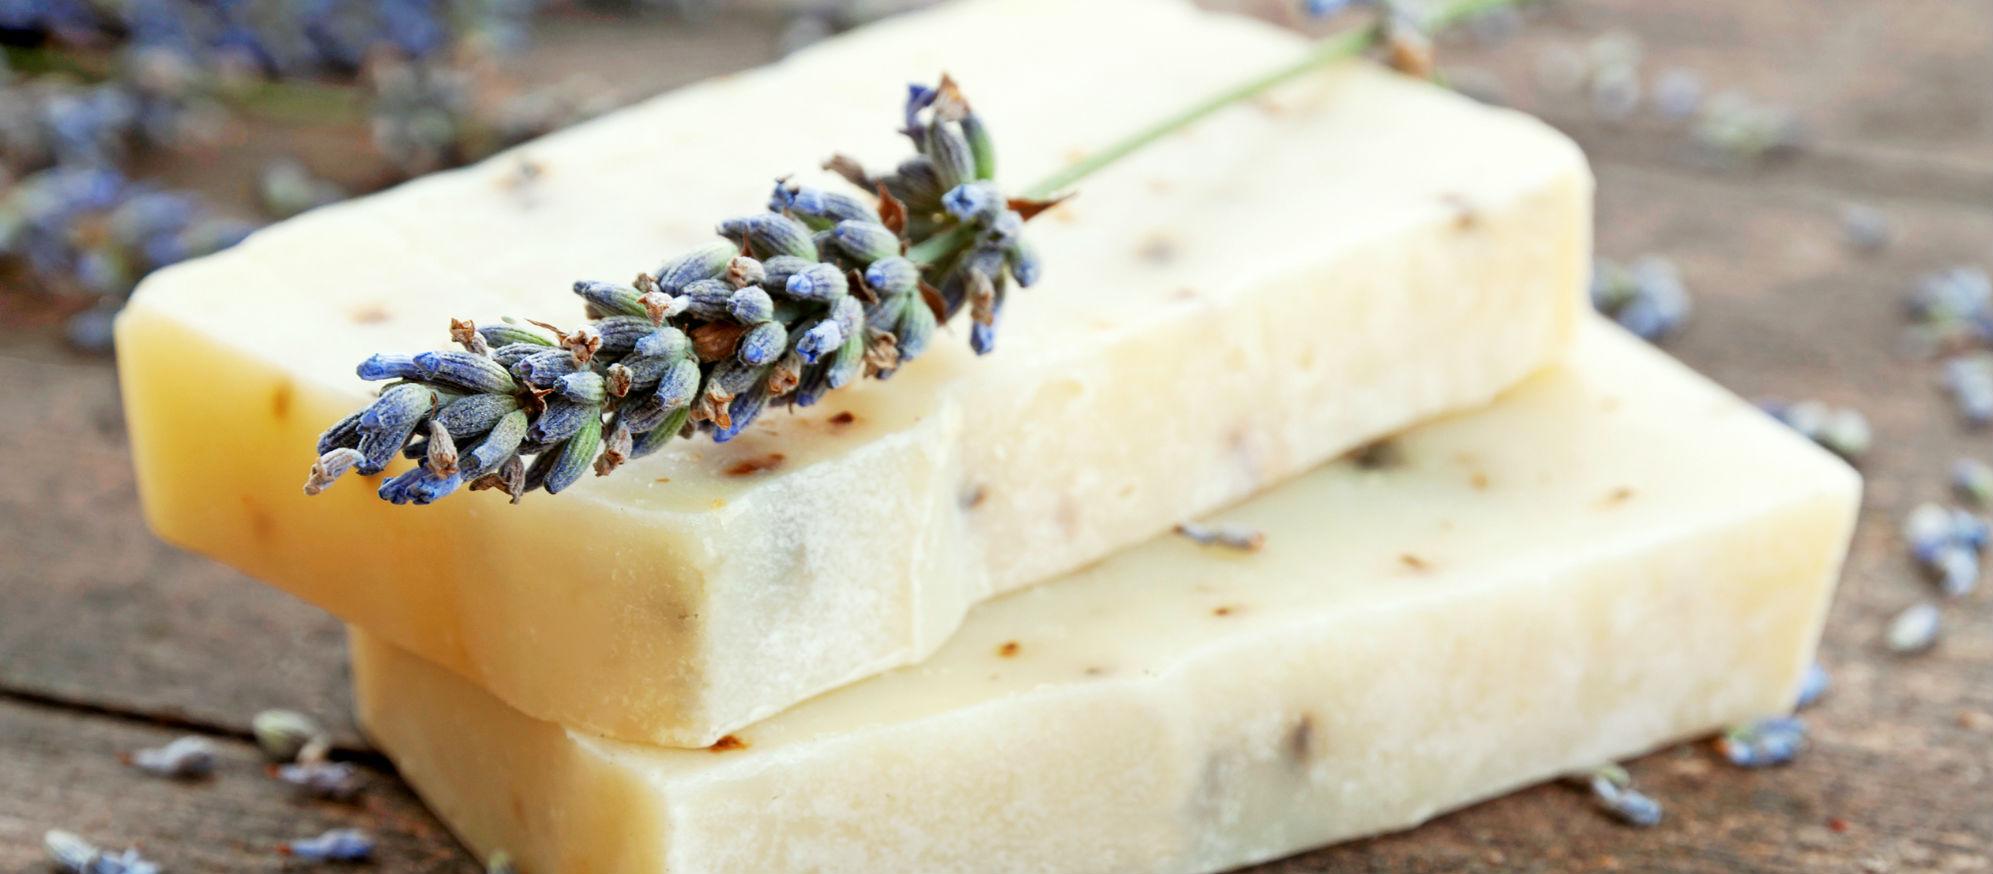 Homemade Soapmaking Articles hero